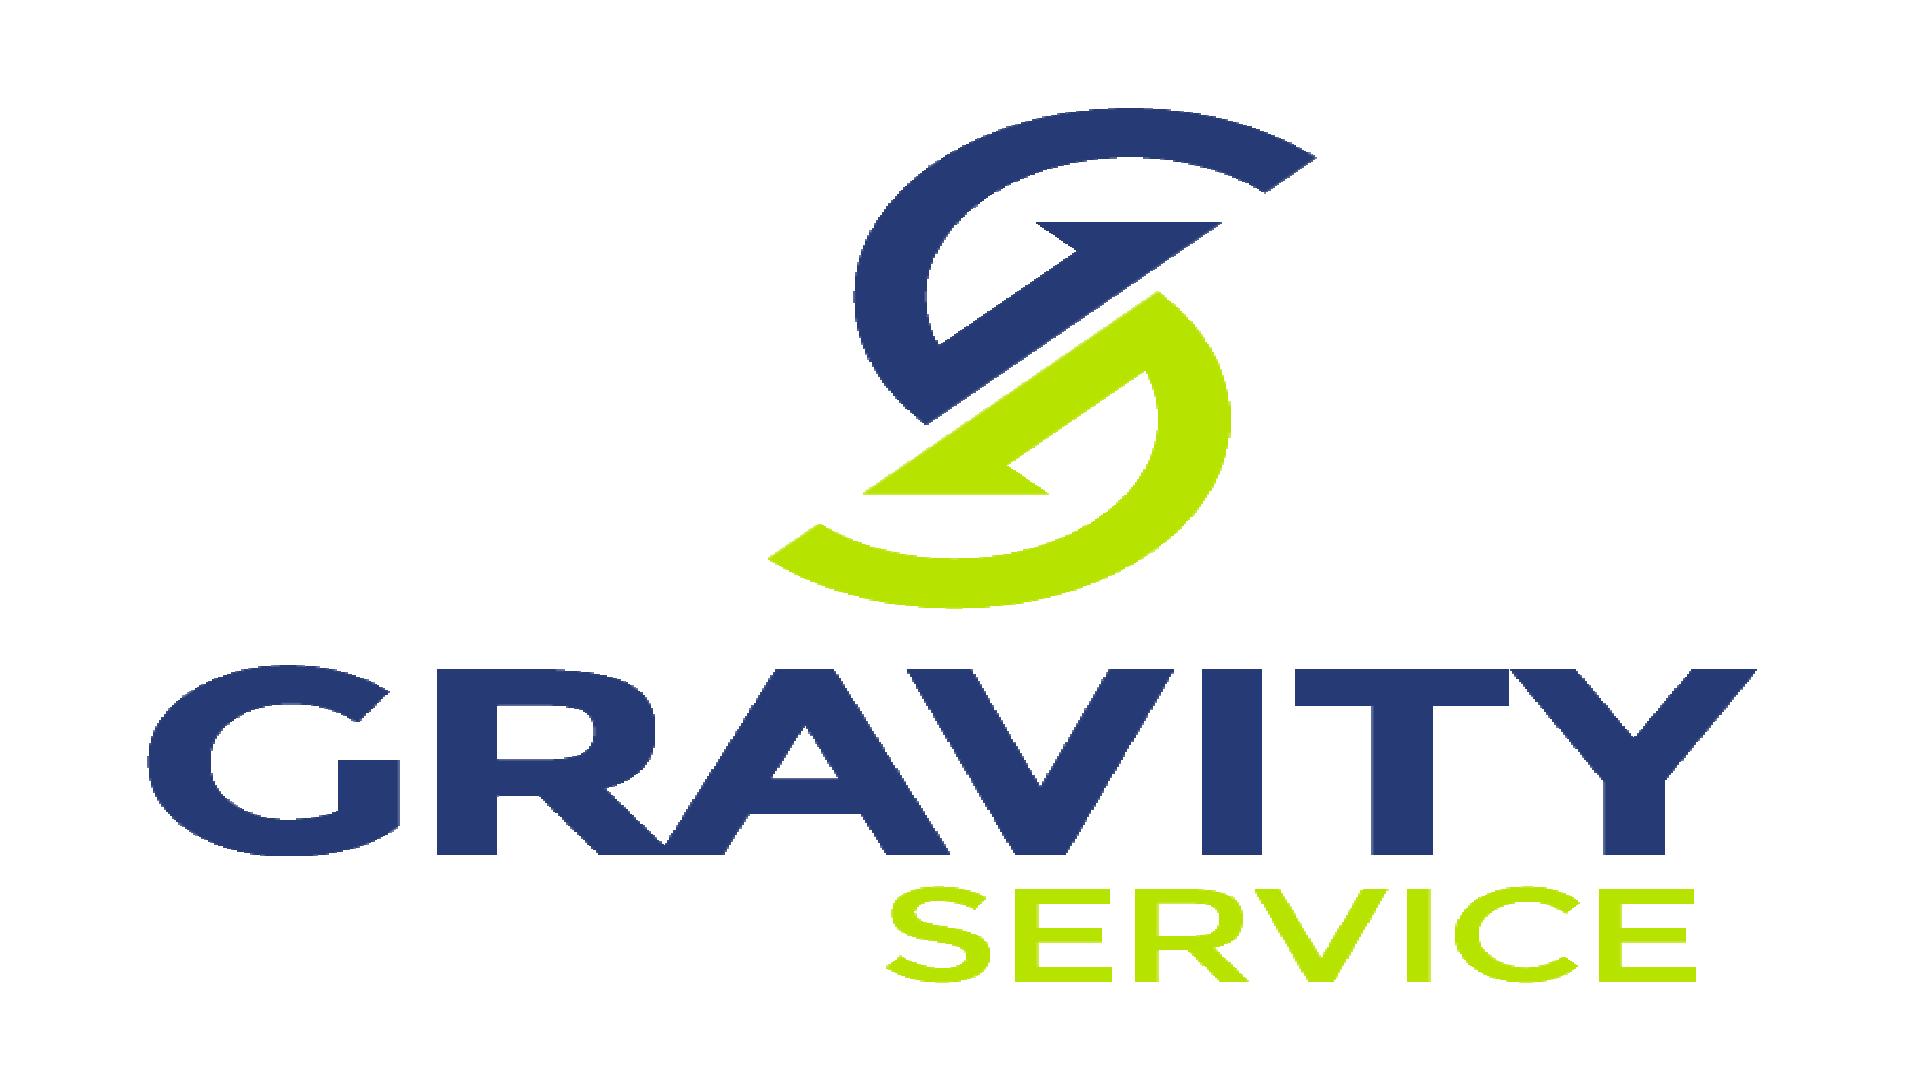 GRAVITY SERVICE S.R.L.